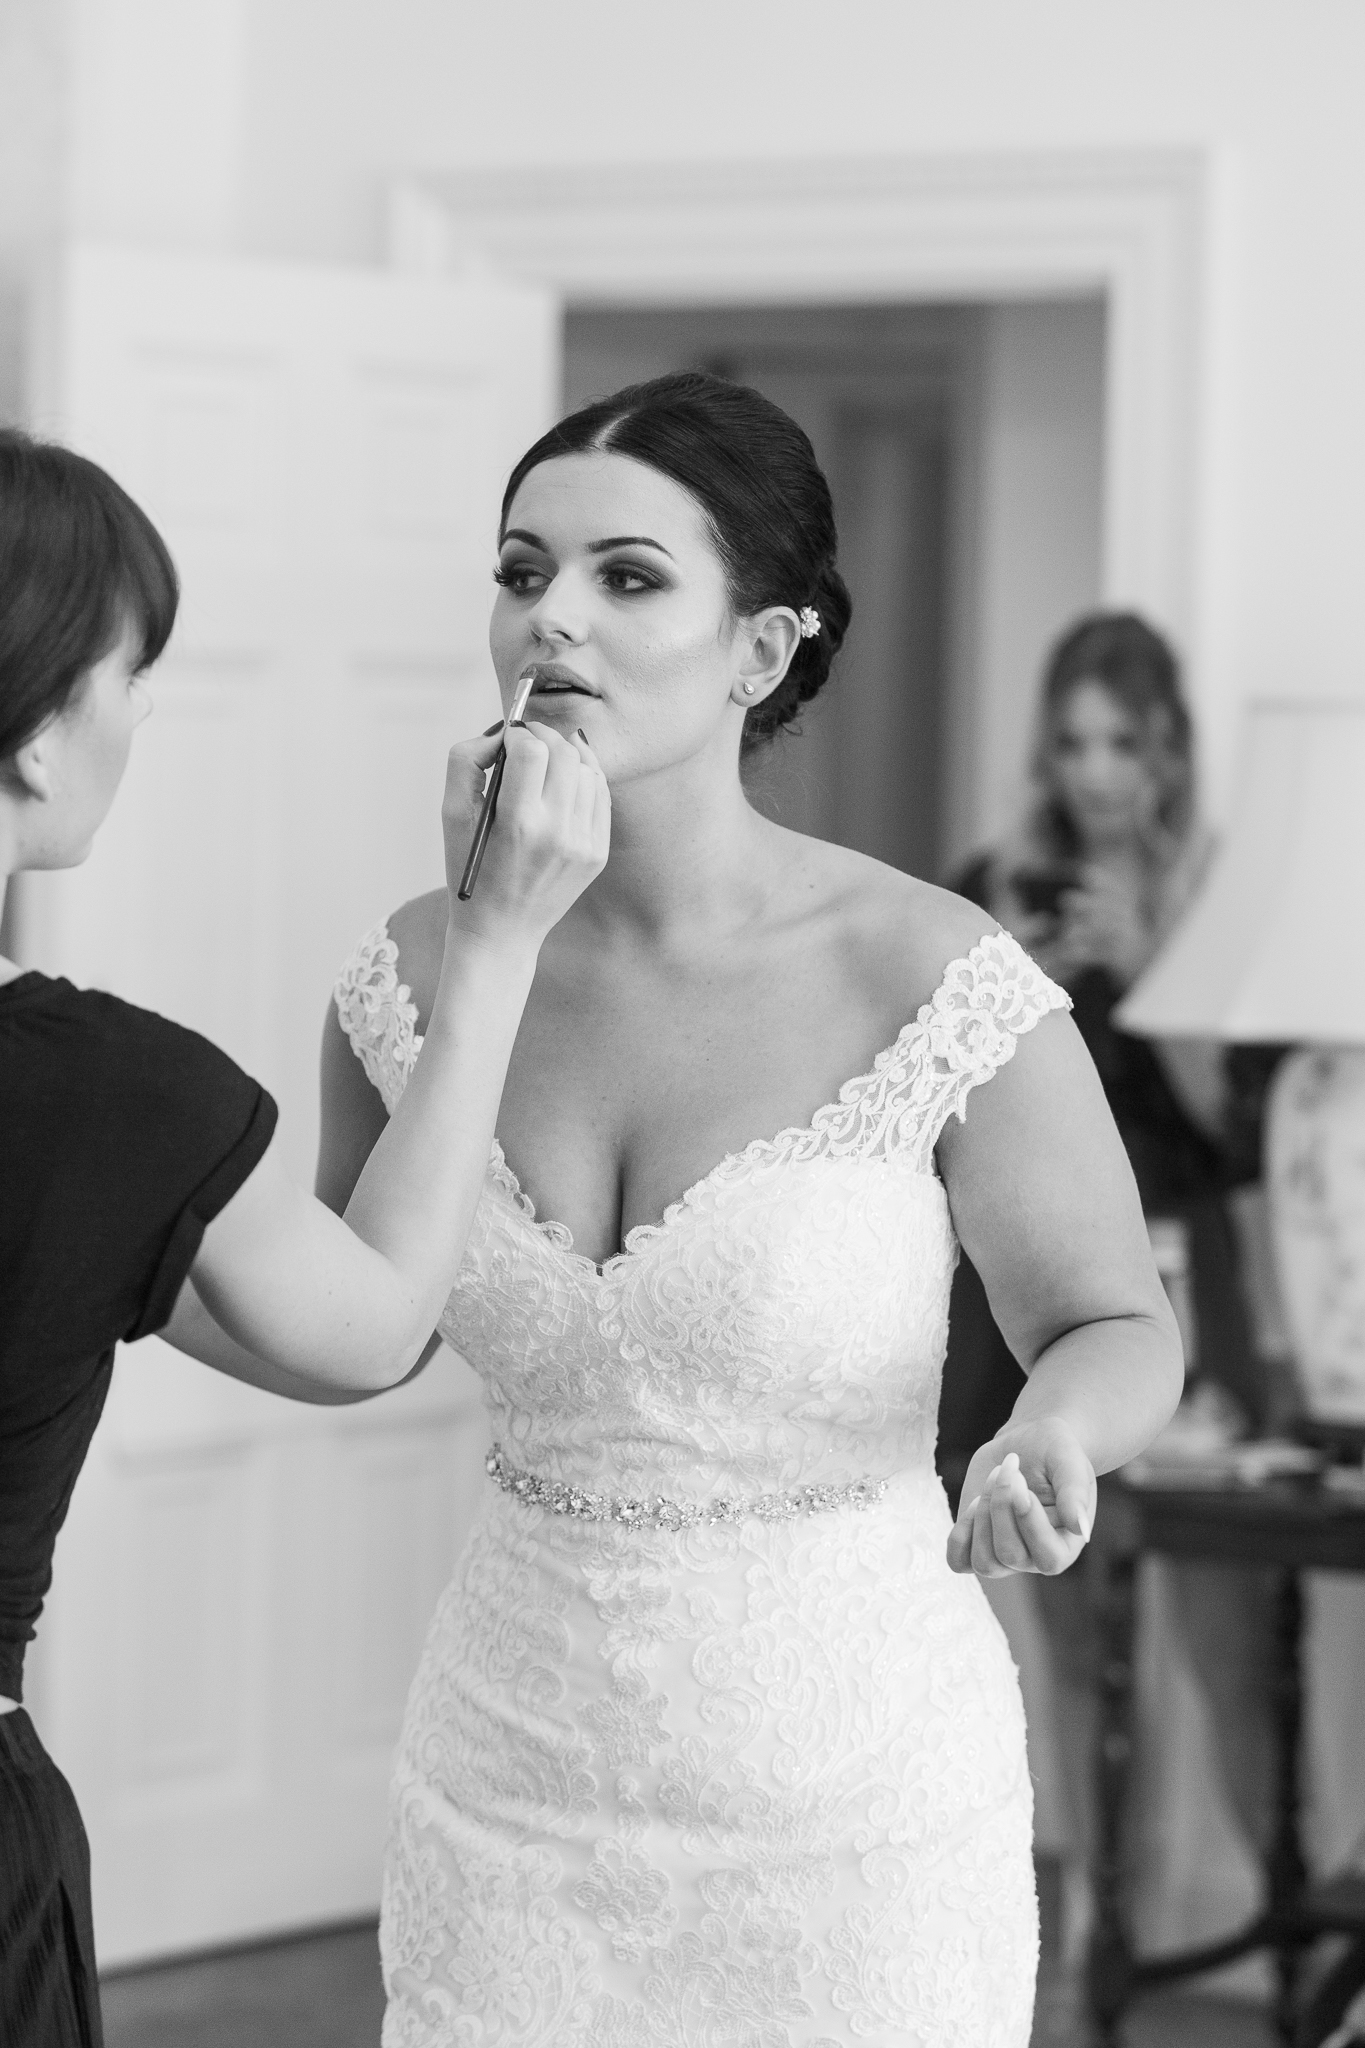 Bridal_Make_up_prep_natural_wedding_photography_Rachel_Thornhill_Photographer